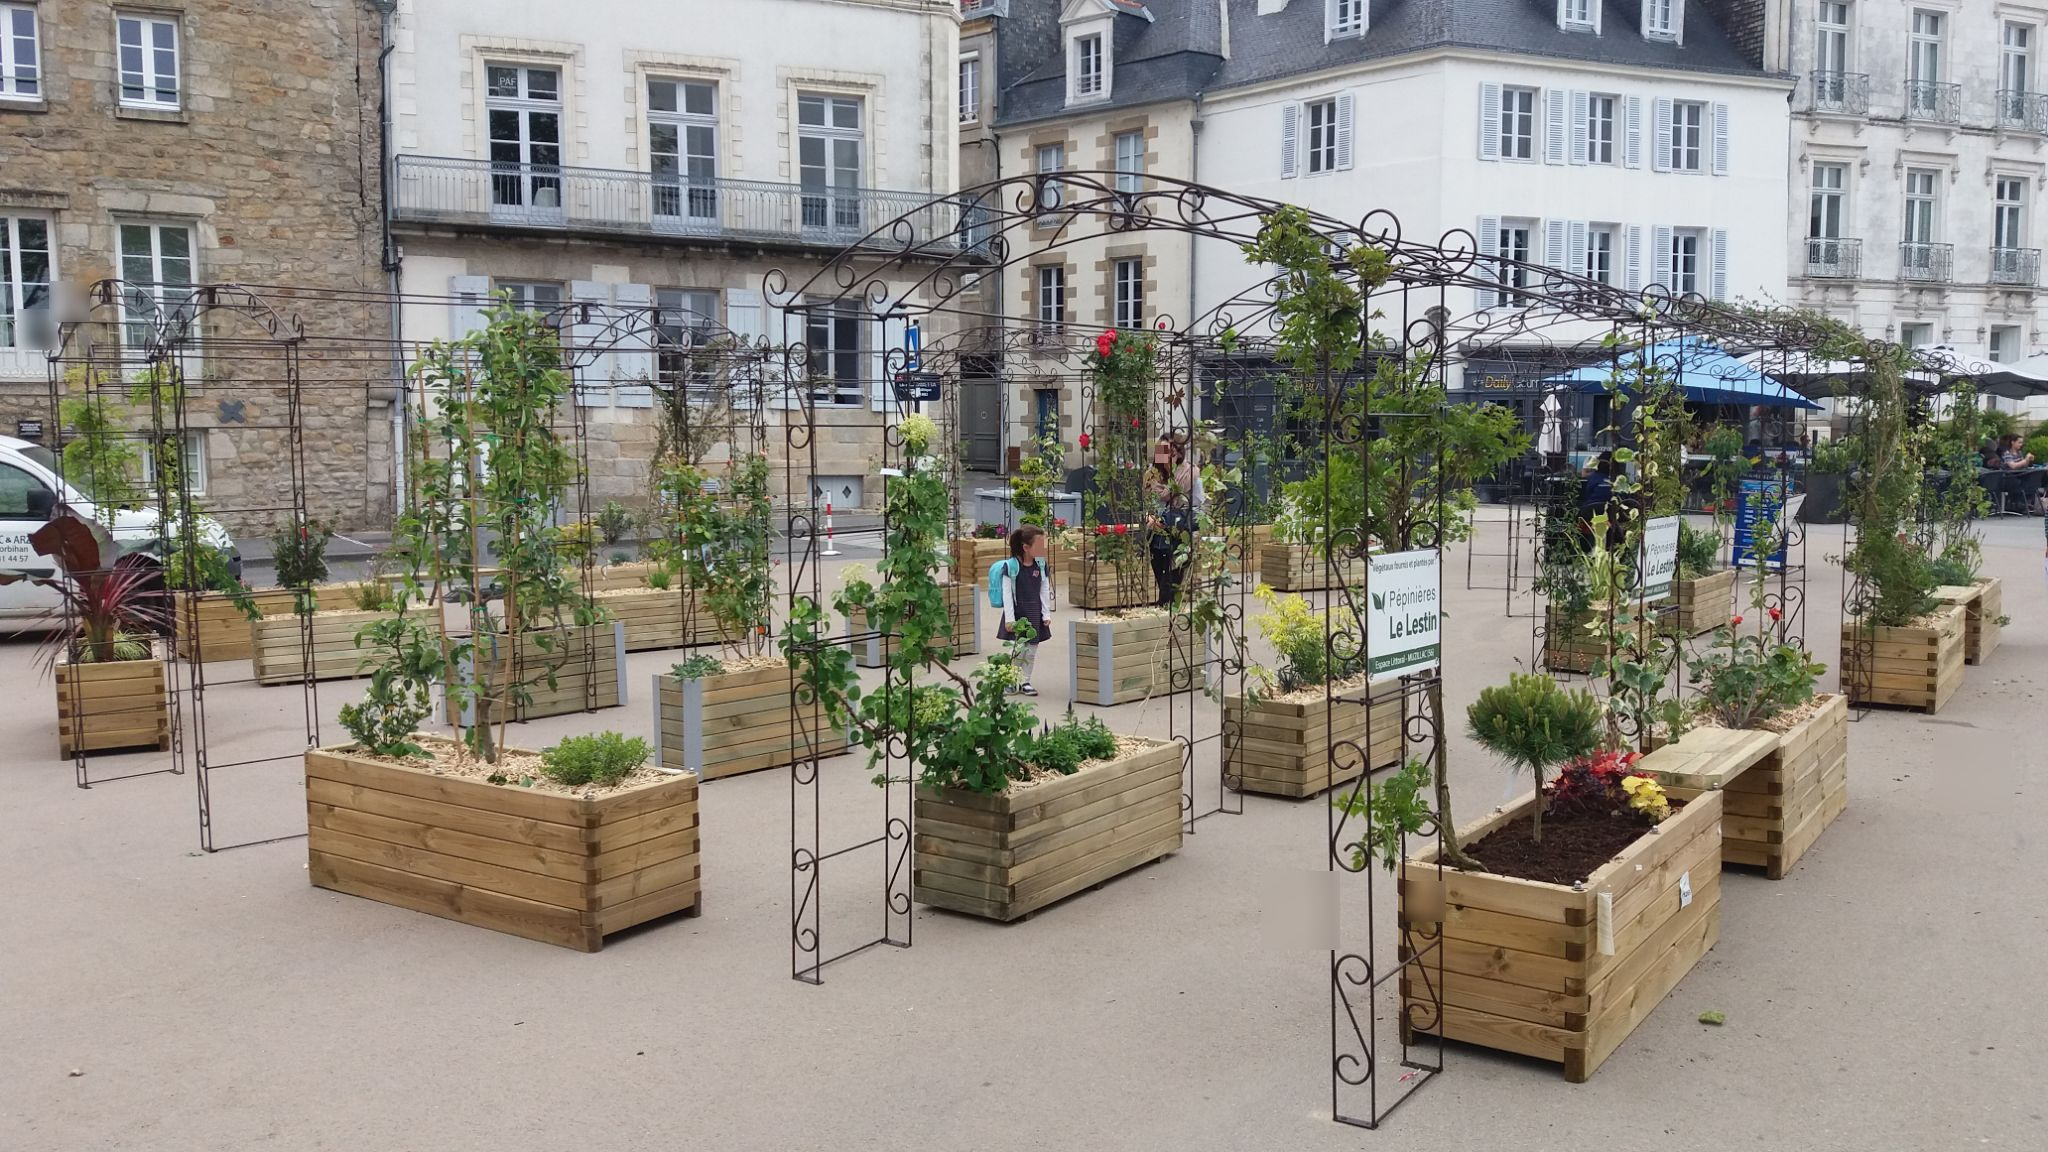 Pepinieres-le-lestin-jardins-ephemeres-2019